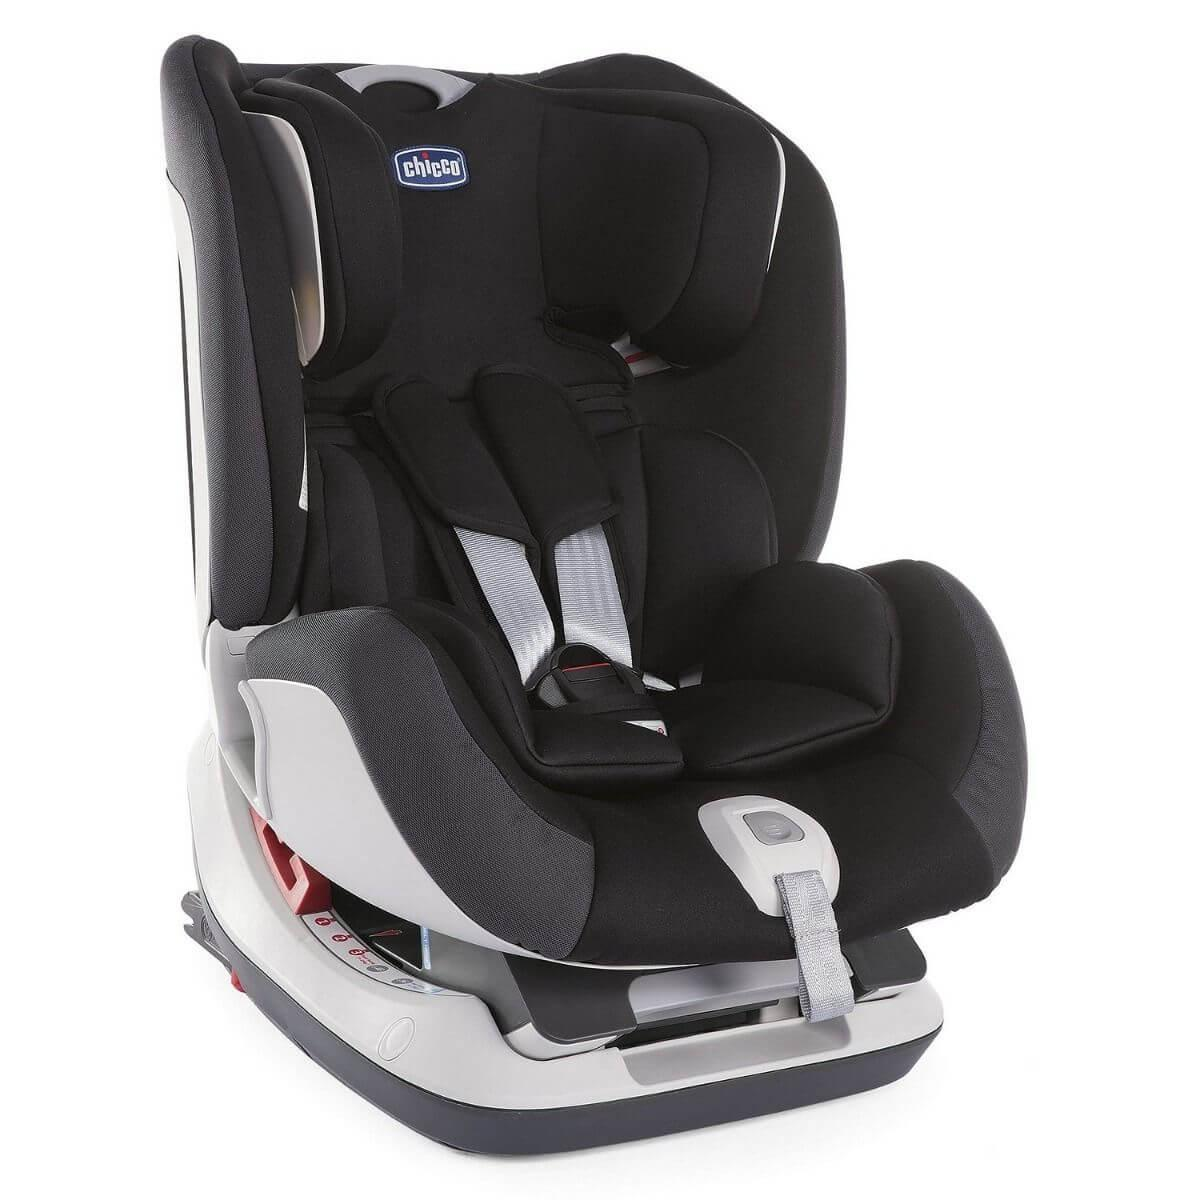 Chicco: Автокресло Seat Up 012 Jet Black (0-25 kg) 0+